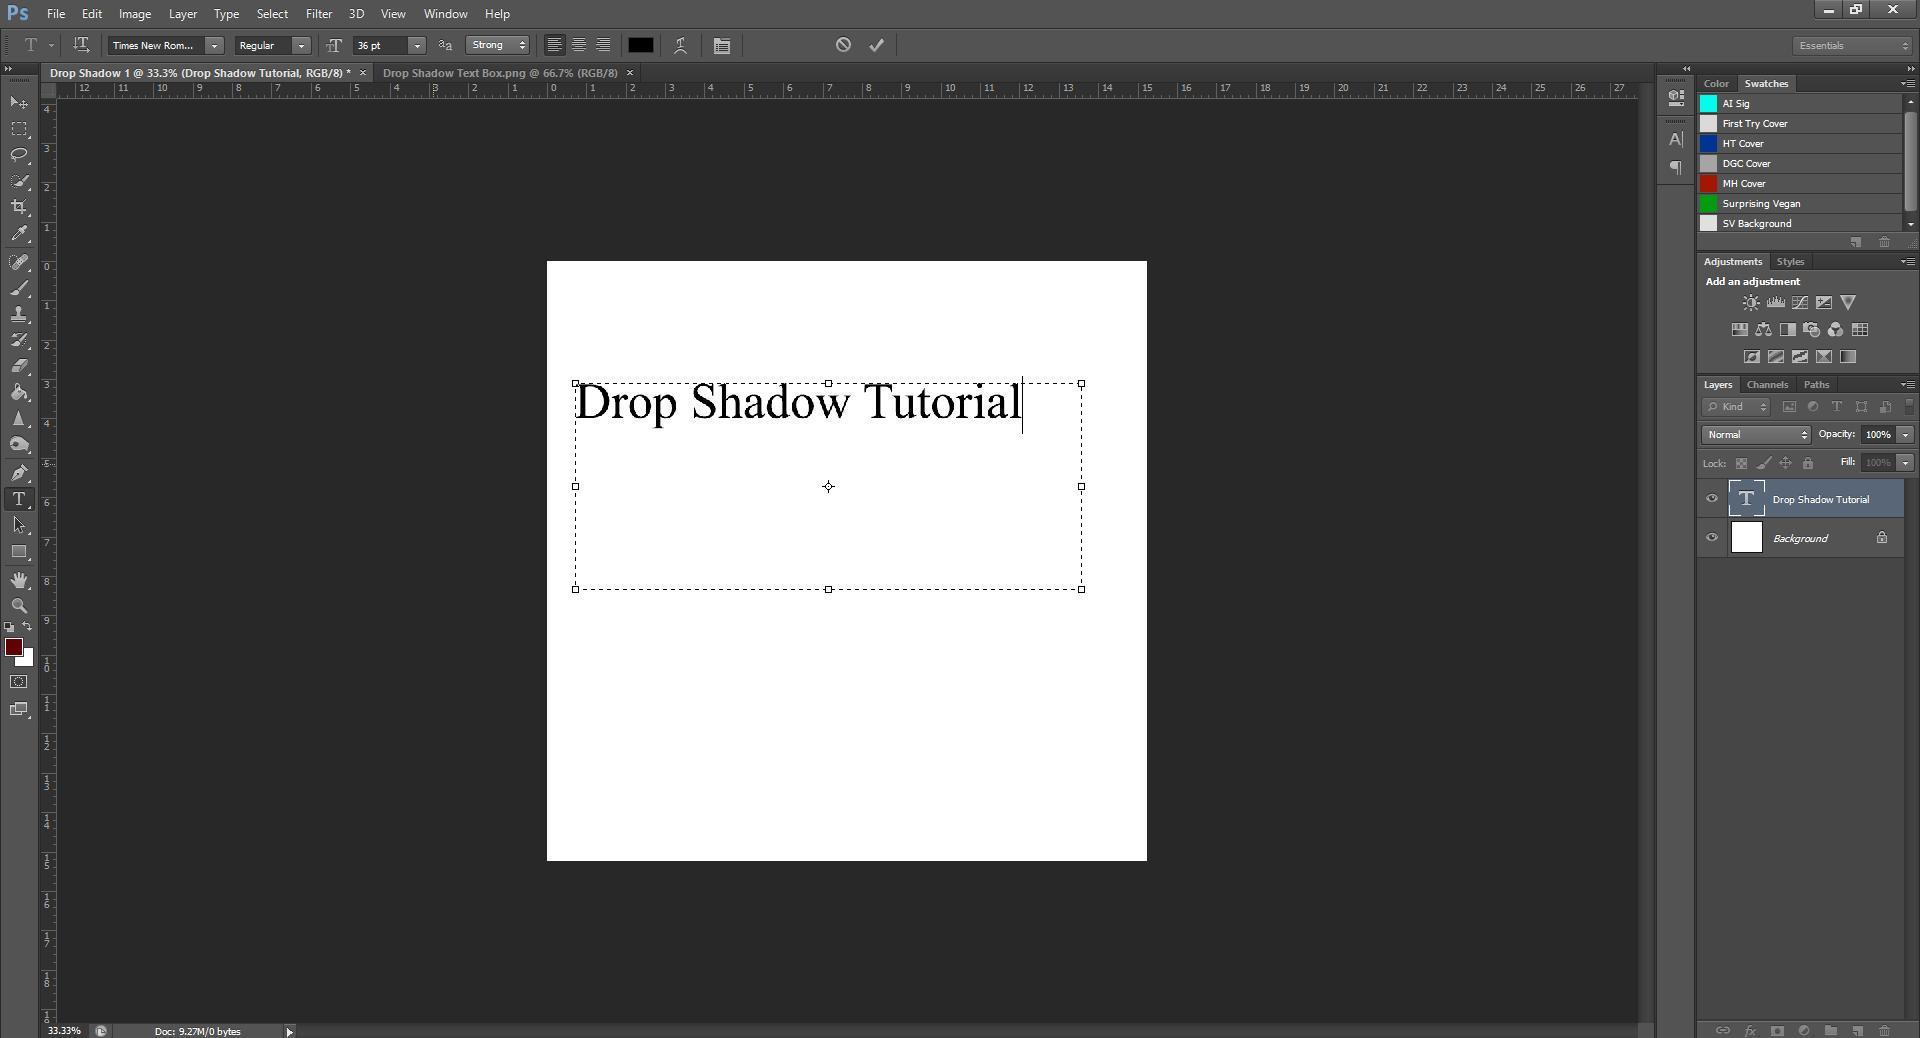 AterImber.com - Writing - Writing Tips - PHSH Tutorial - Drop Shadow - Text Box w Words